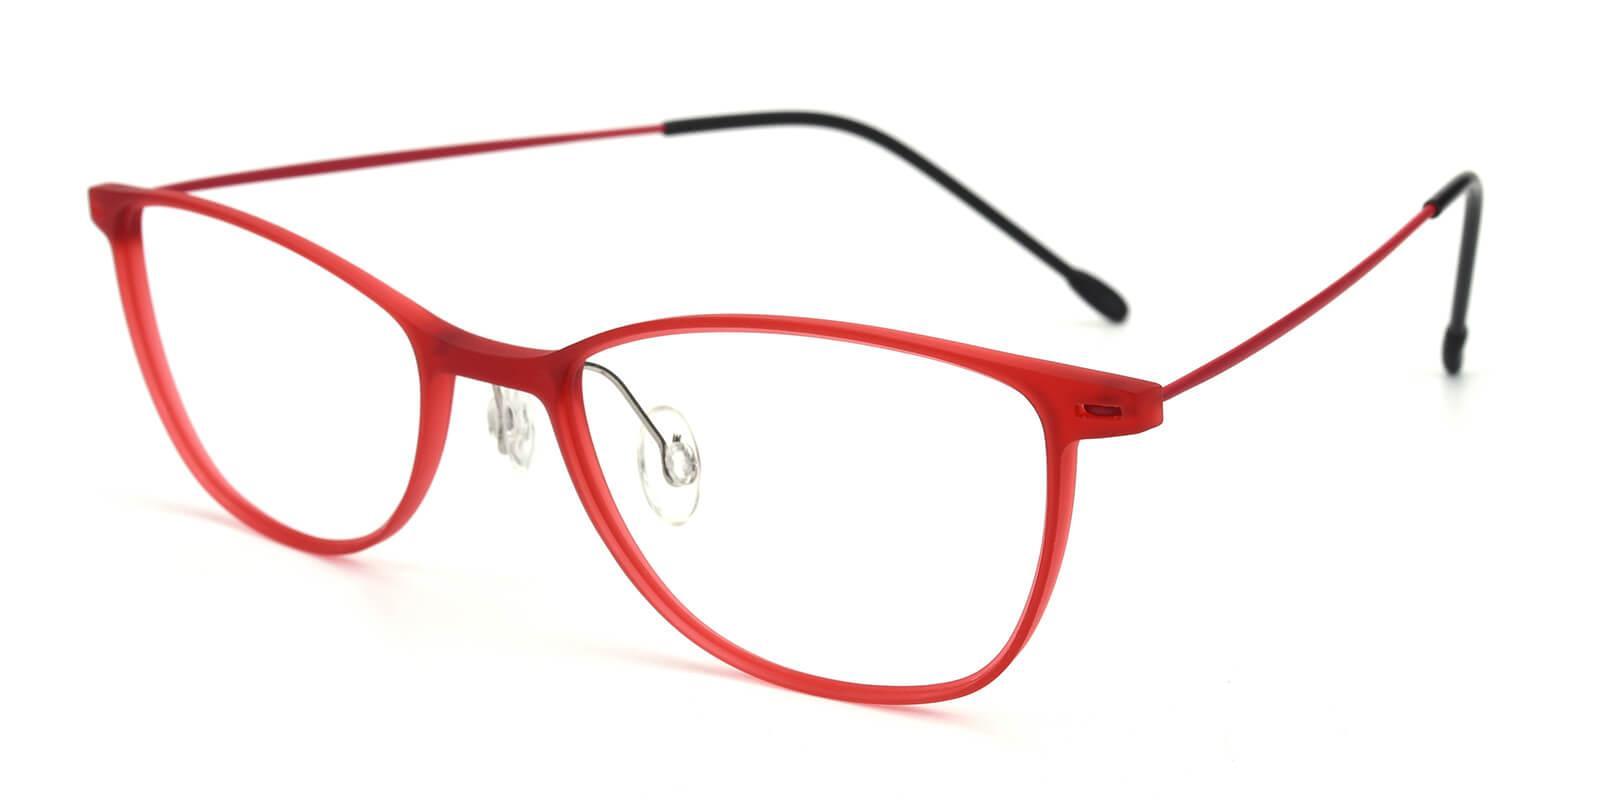 Pridgen-Red-Rectangle / Cat-Combination-Eyeglasses-additional1